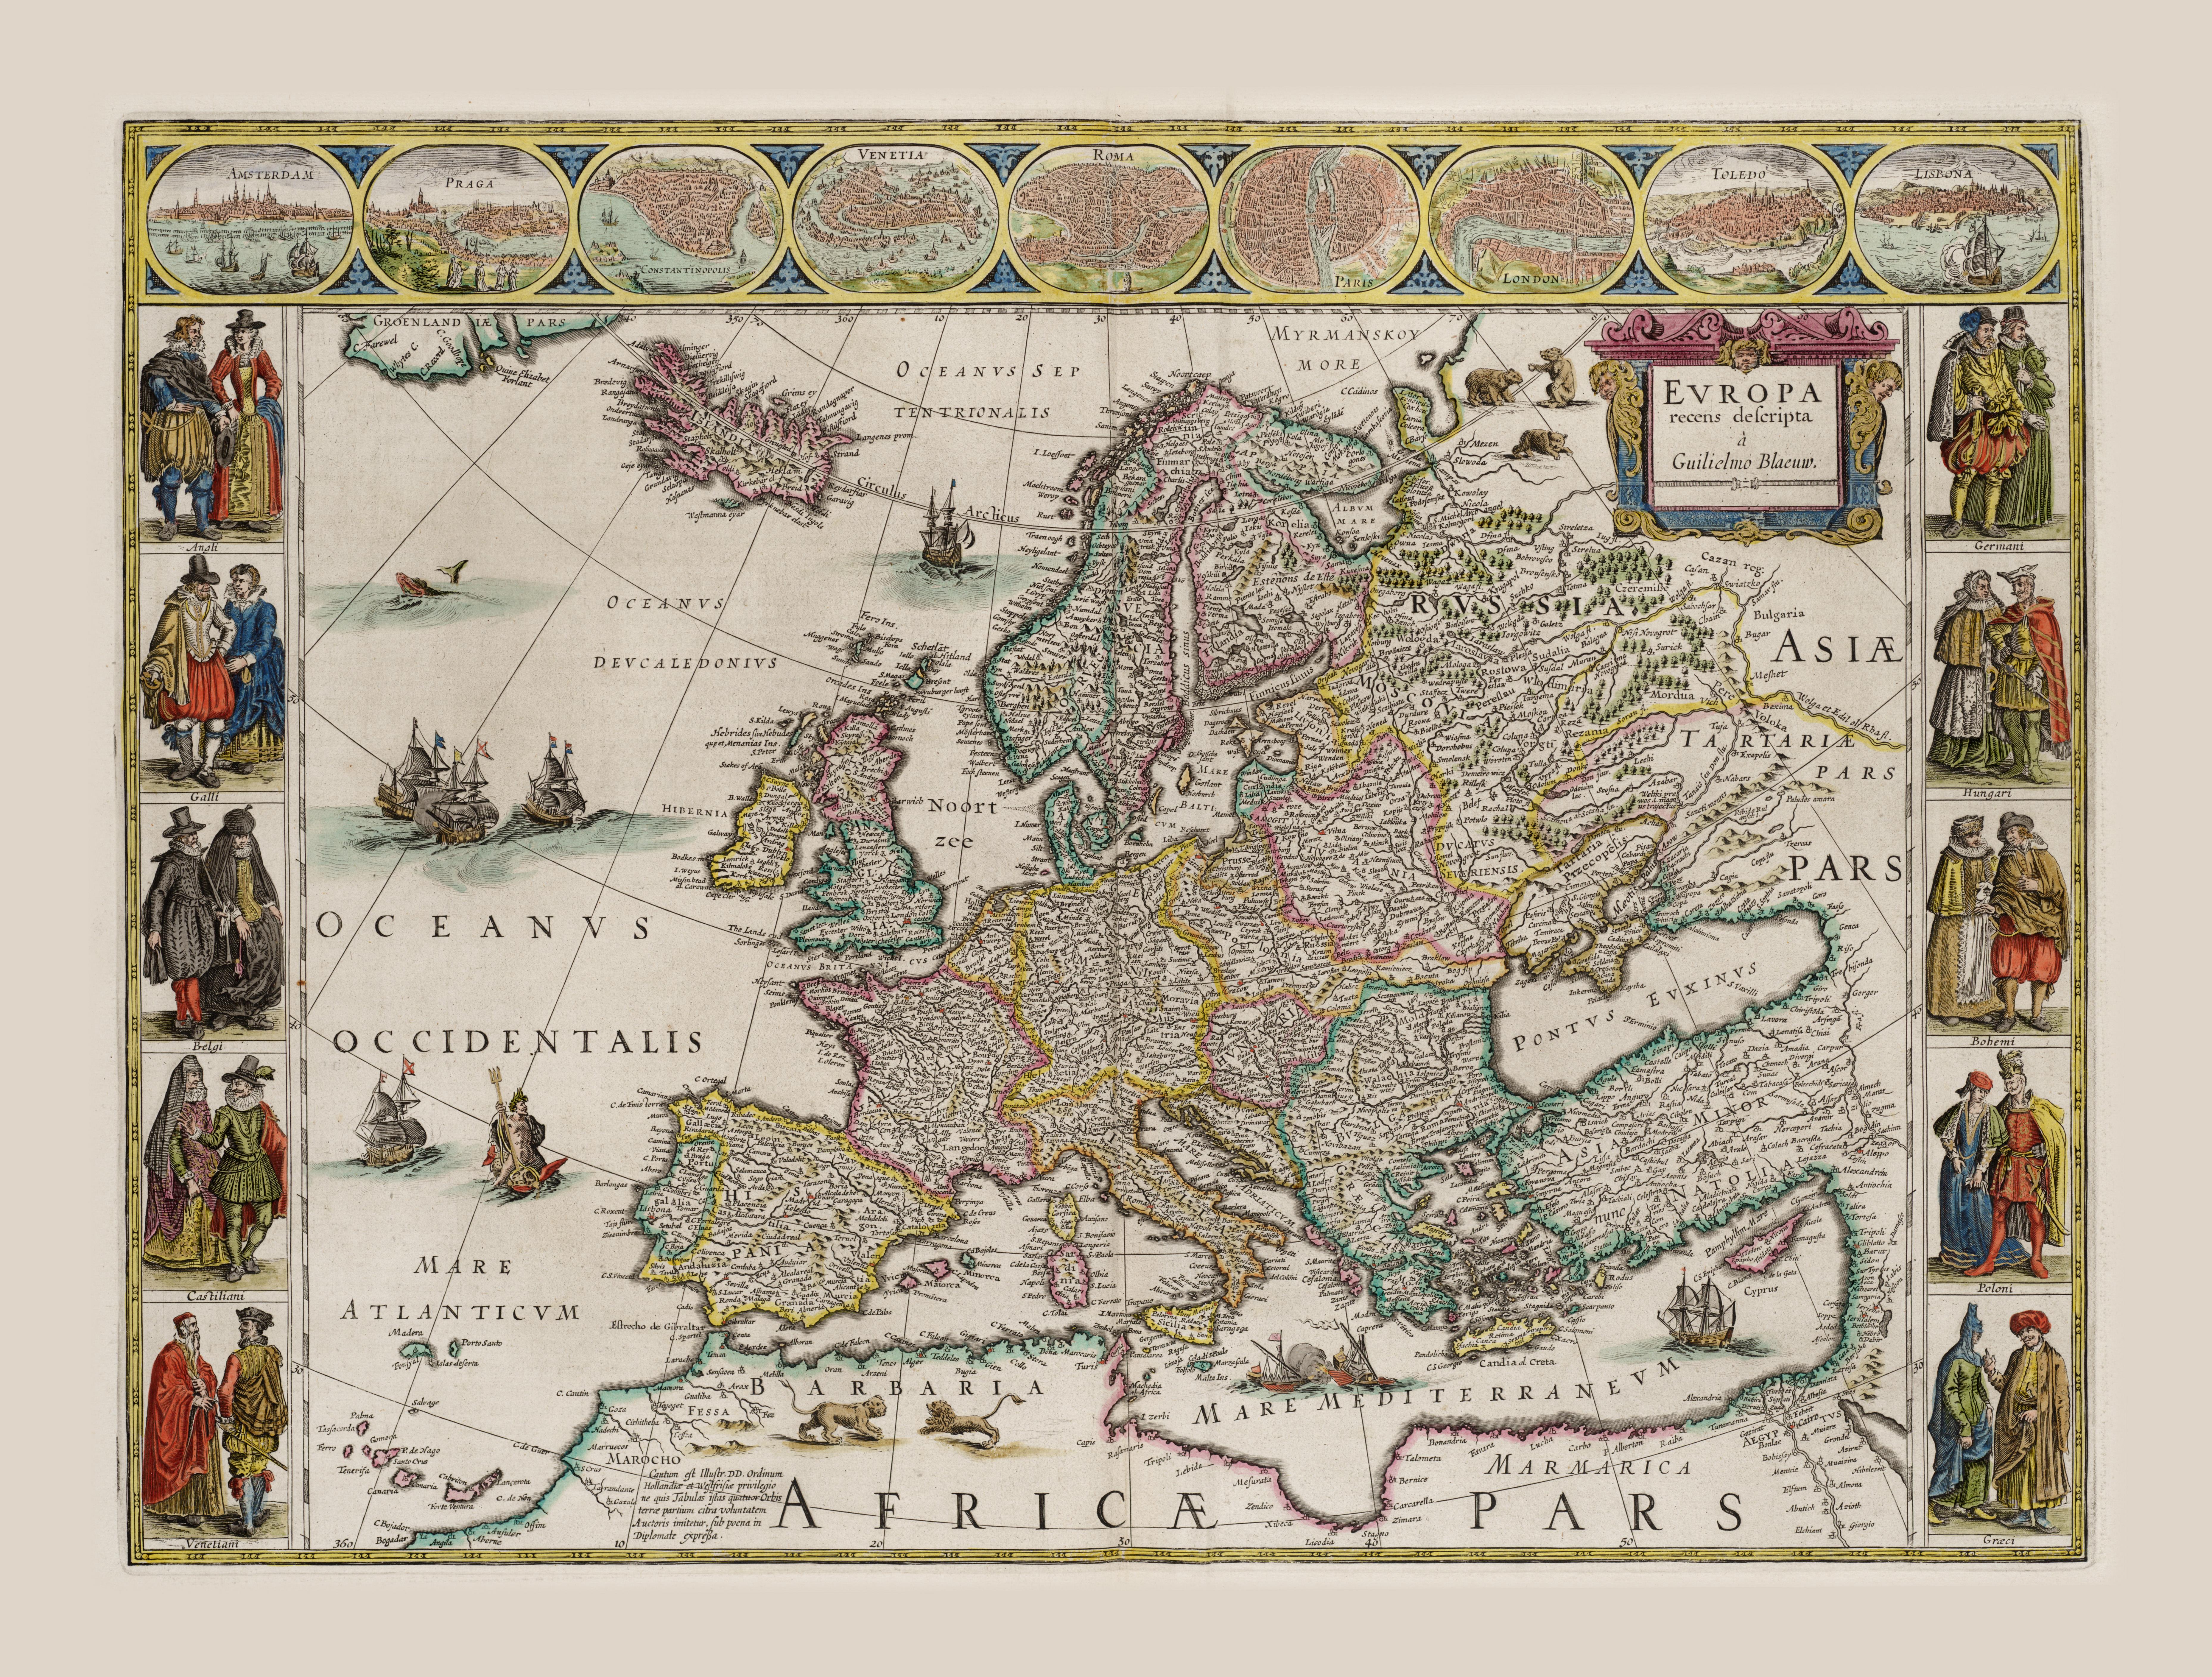 File:1644 Europa Recens Blaeu.jpg